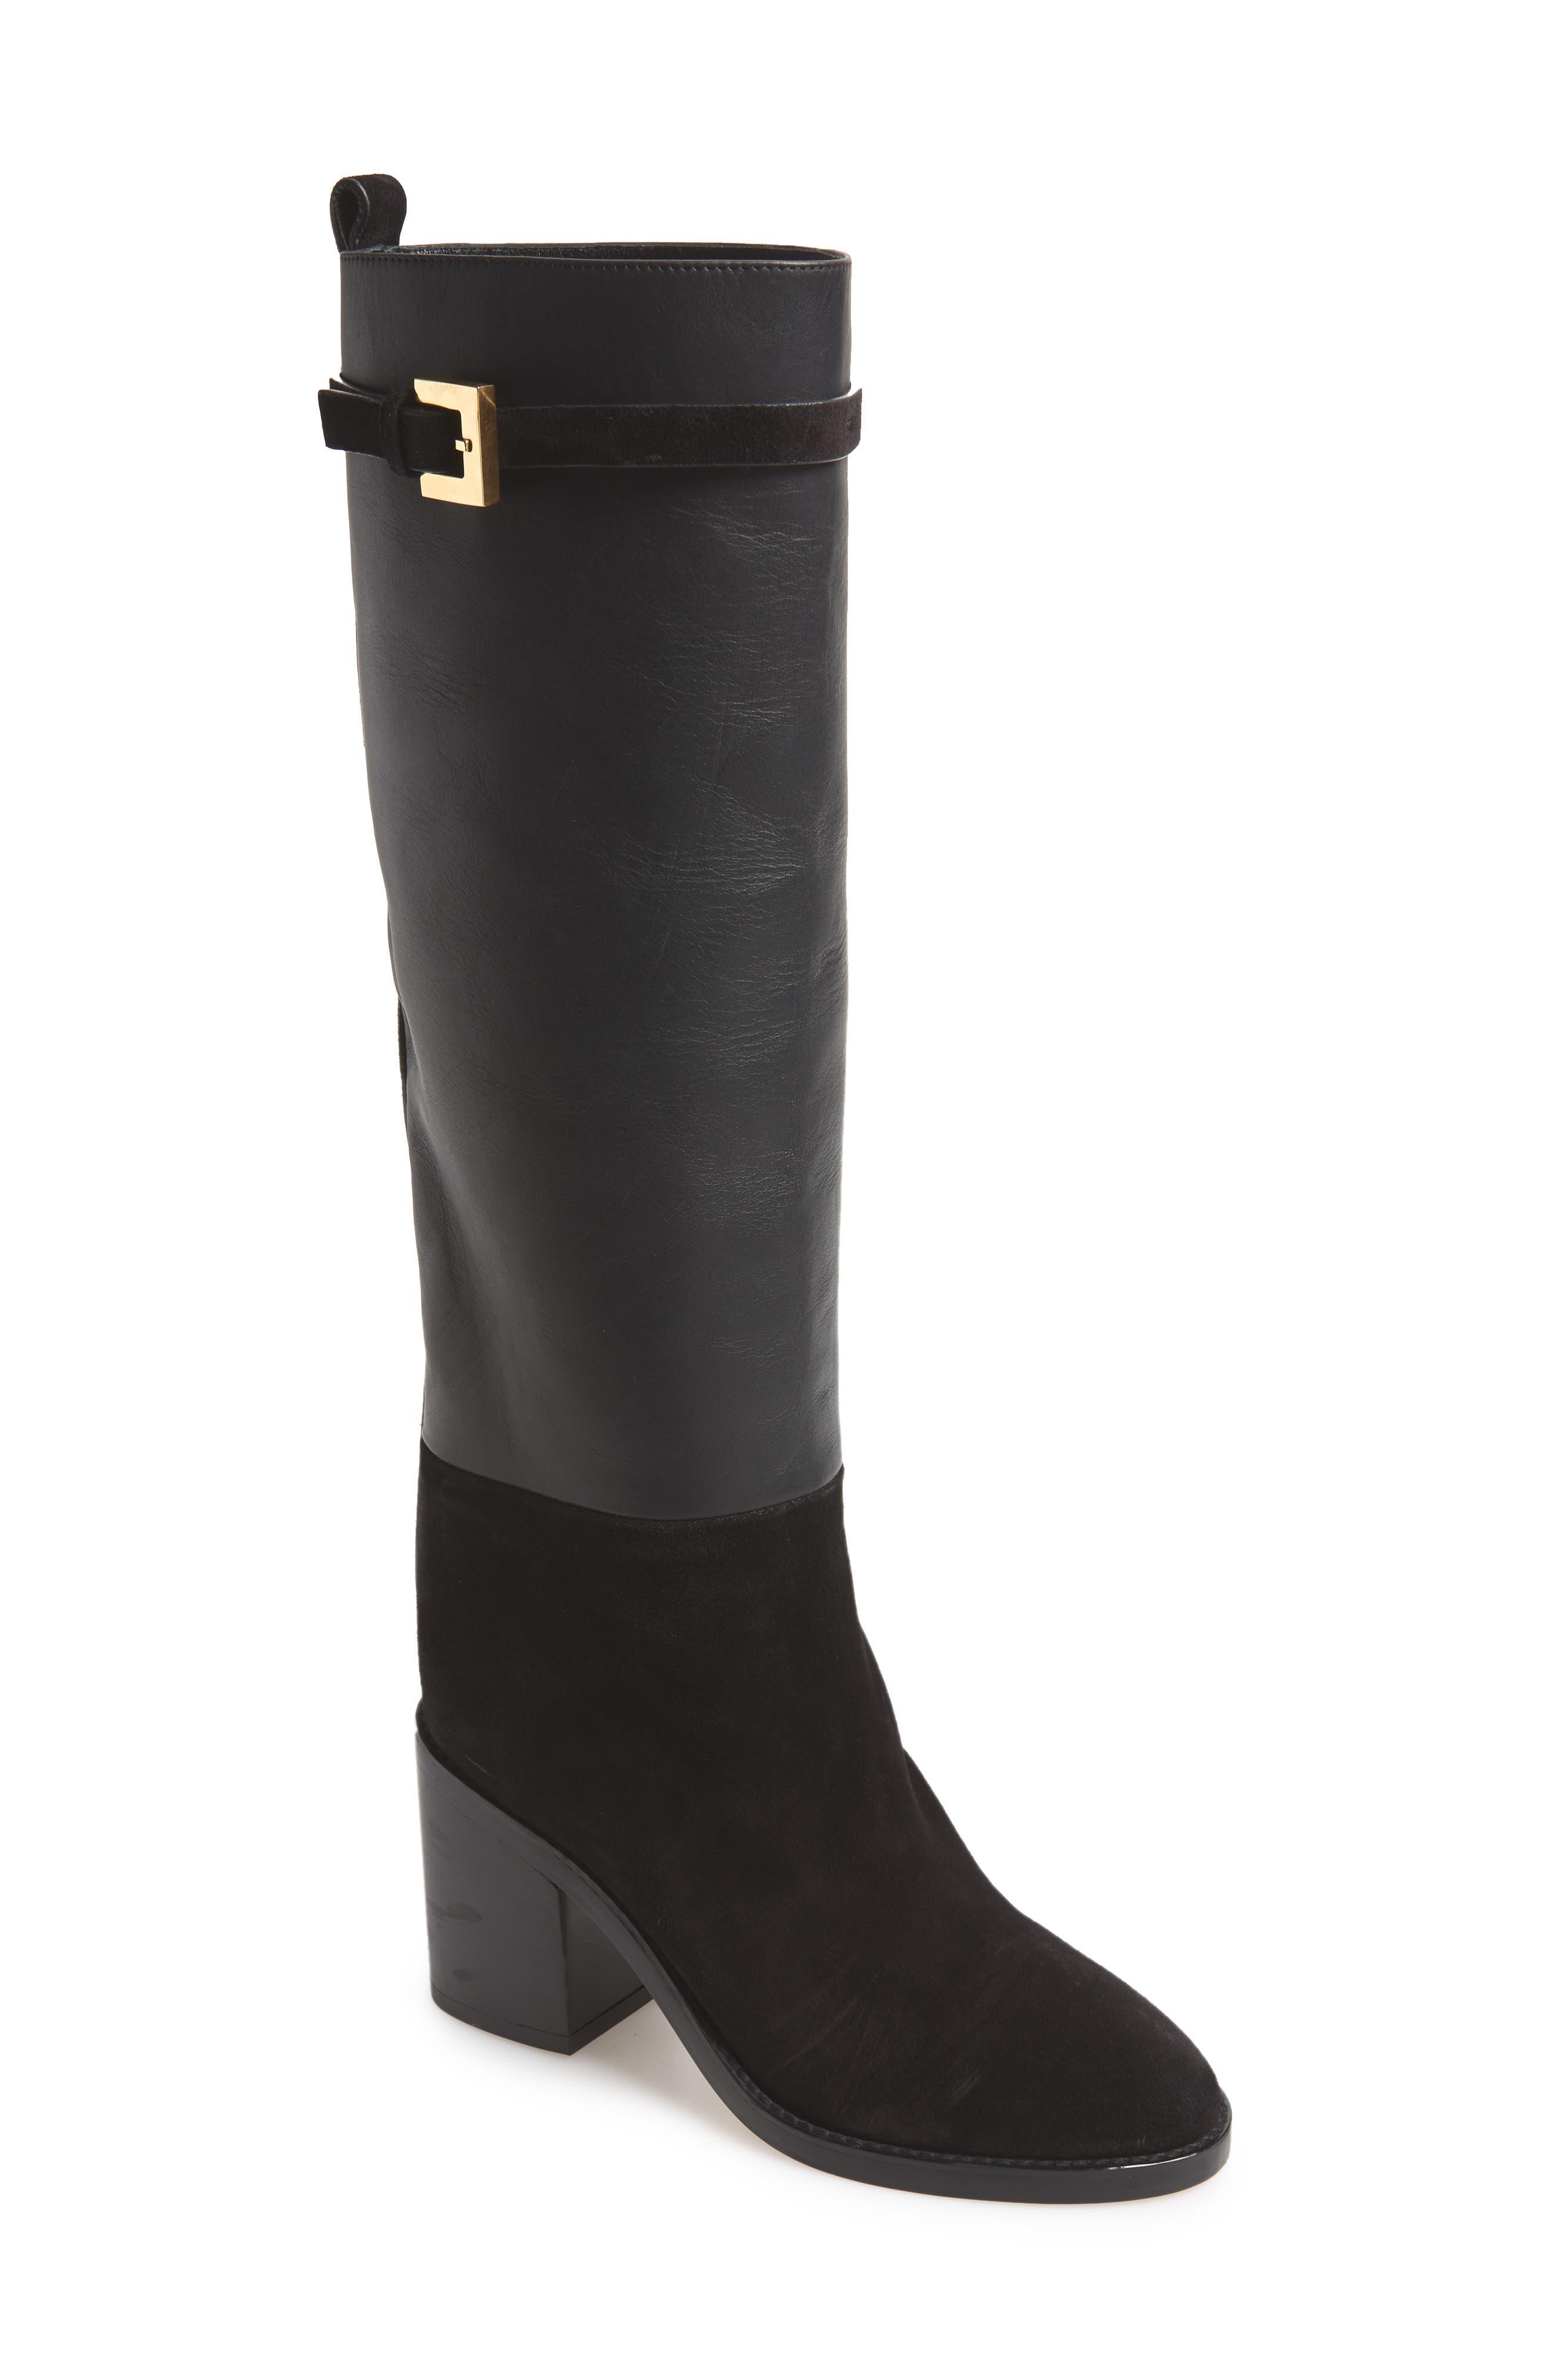 Stuart Weitzman Morrison Knee High Boot- Black